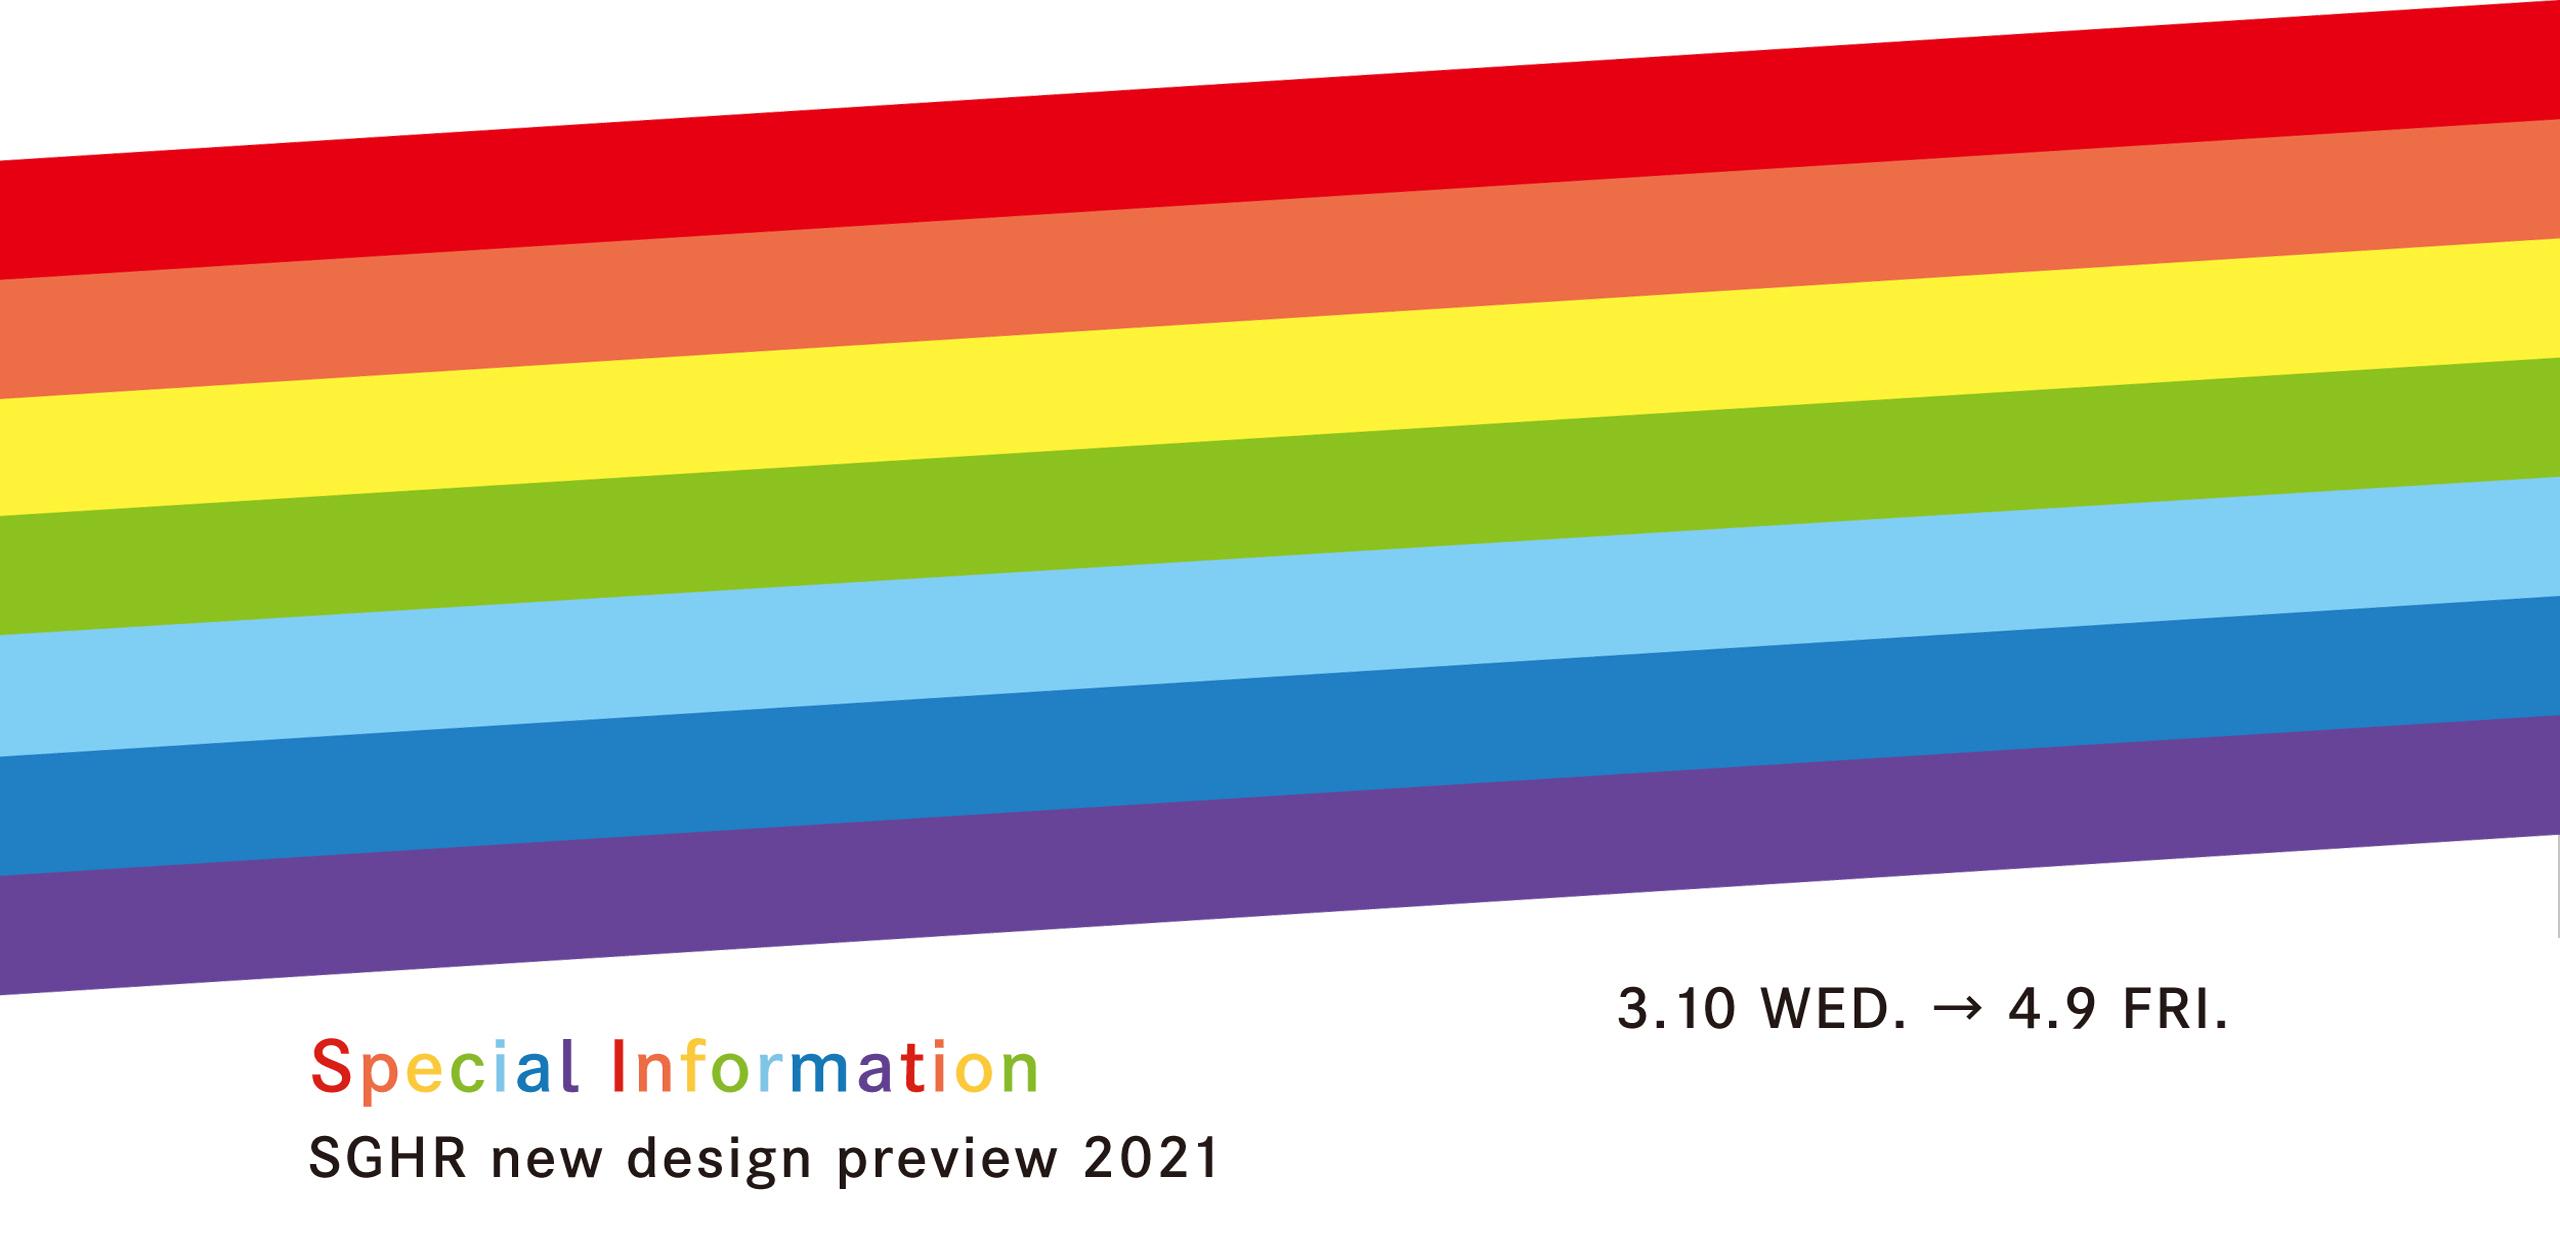 Sghr new design preview 2021